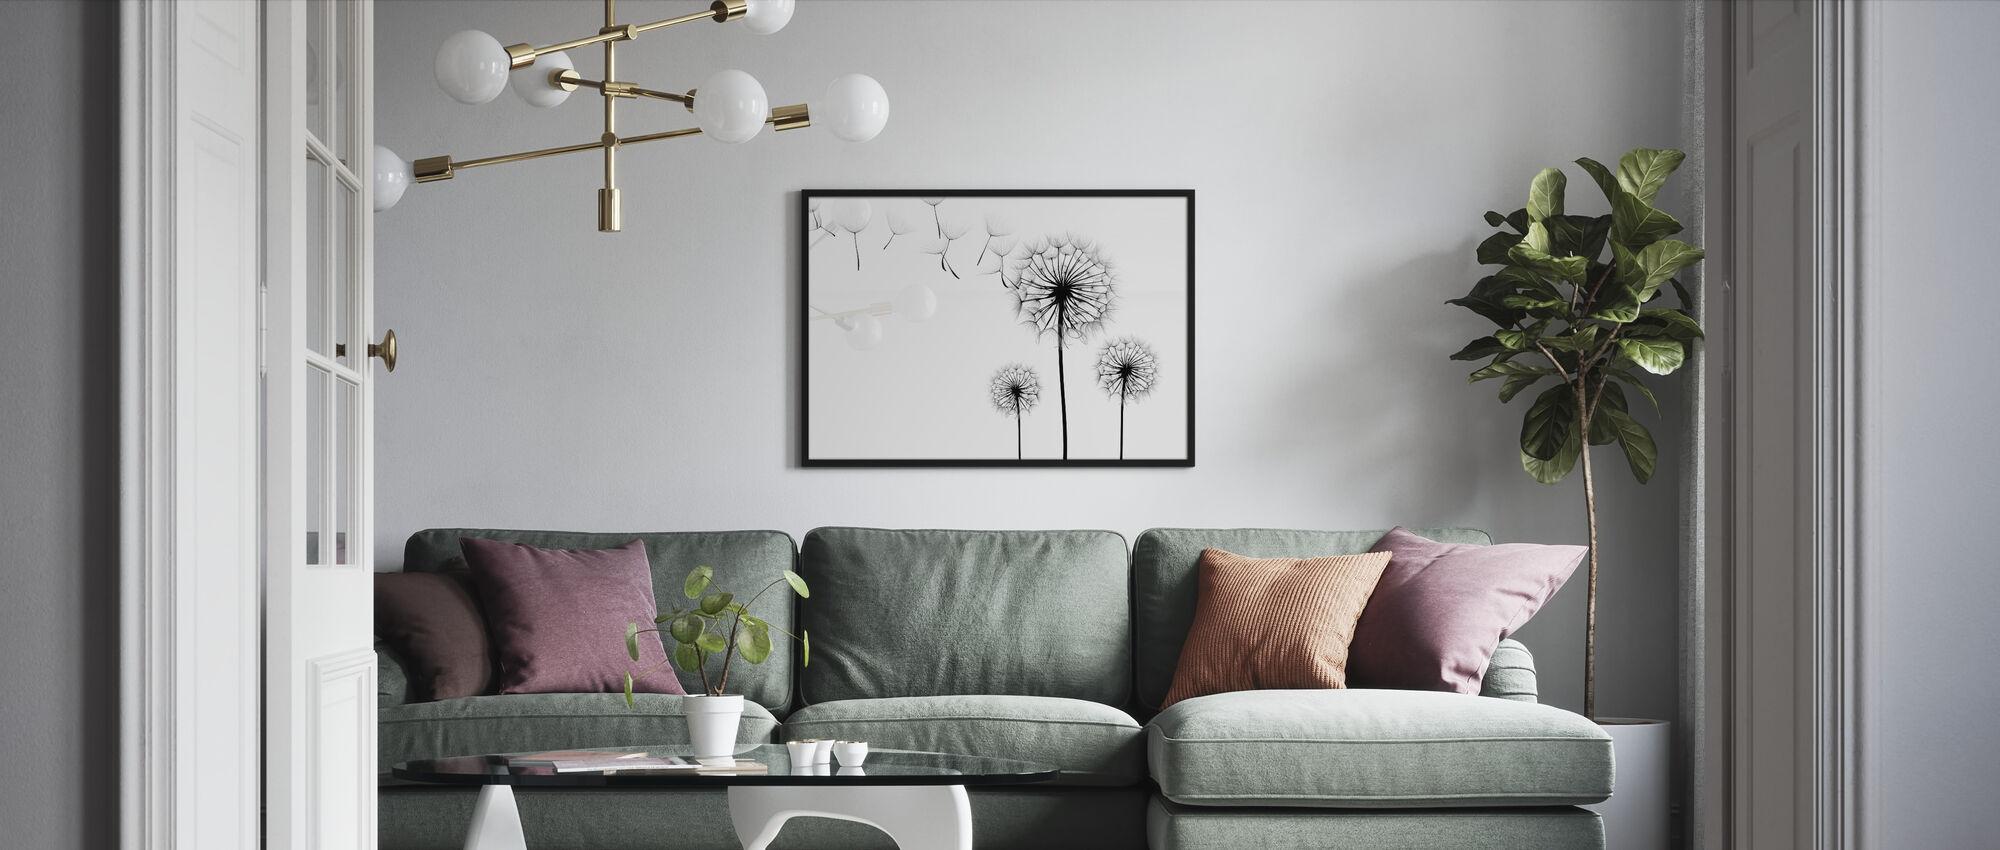 Silhouette of Dandelions Seeds, black and white - Framed print - Living Room